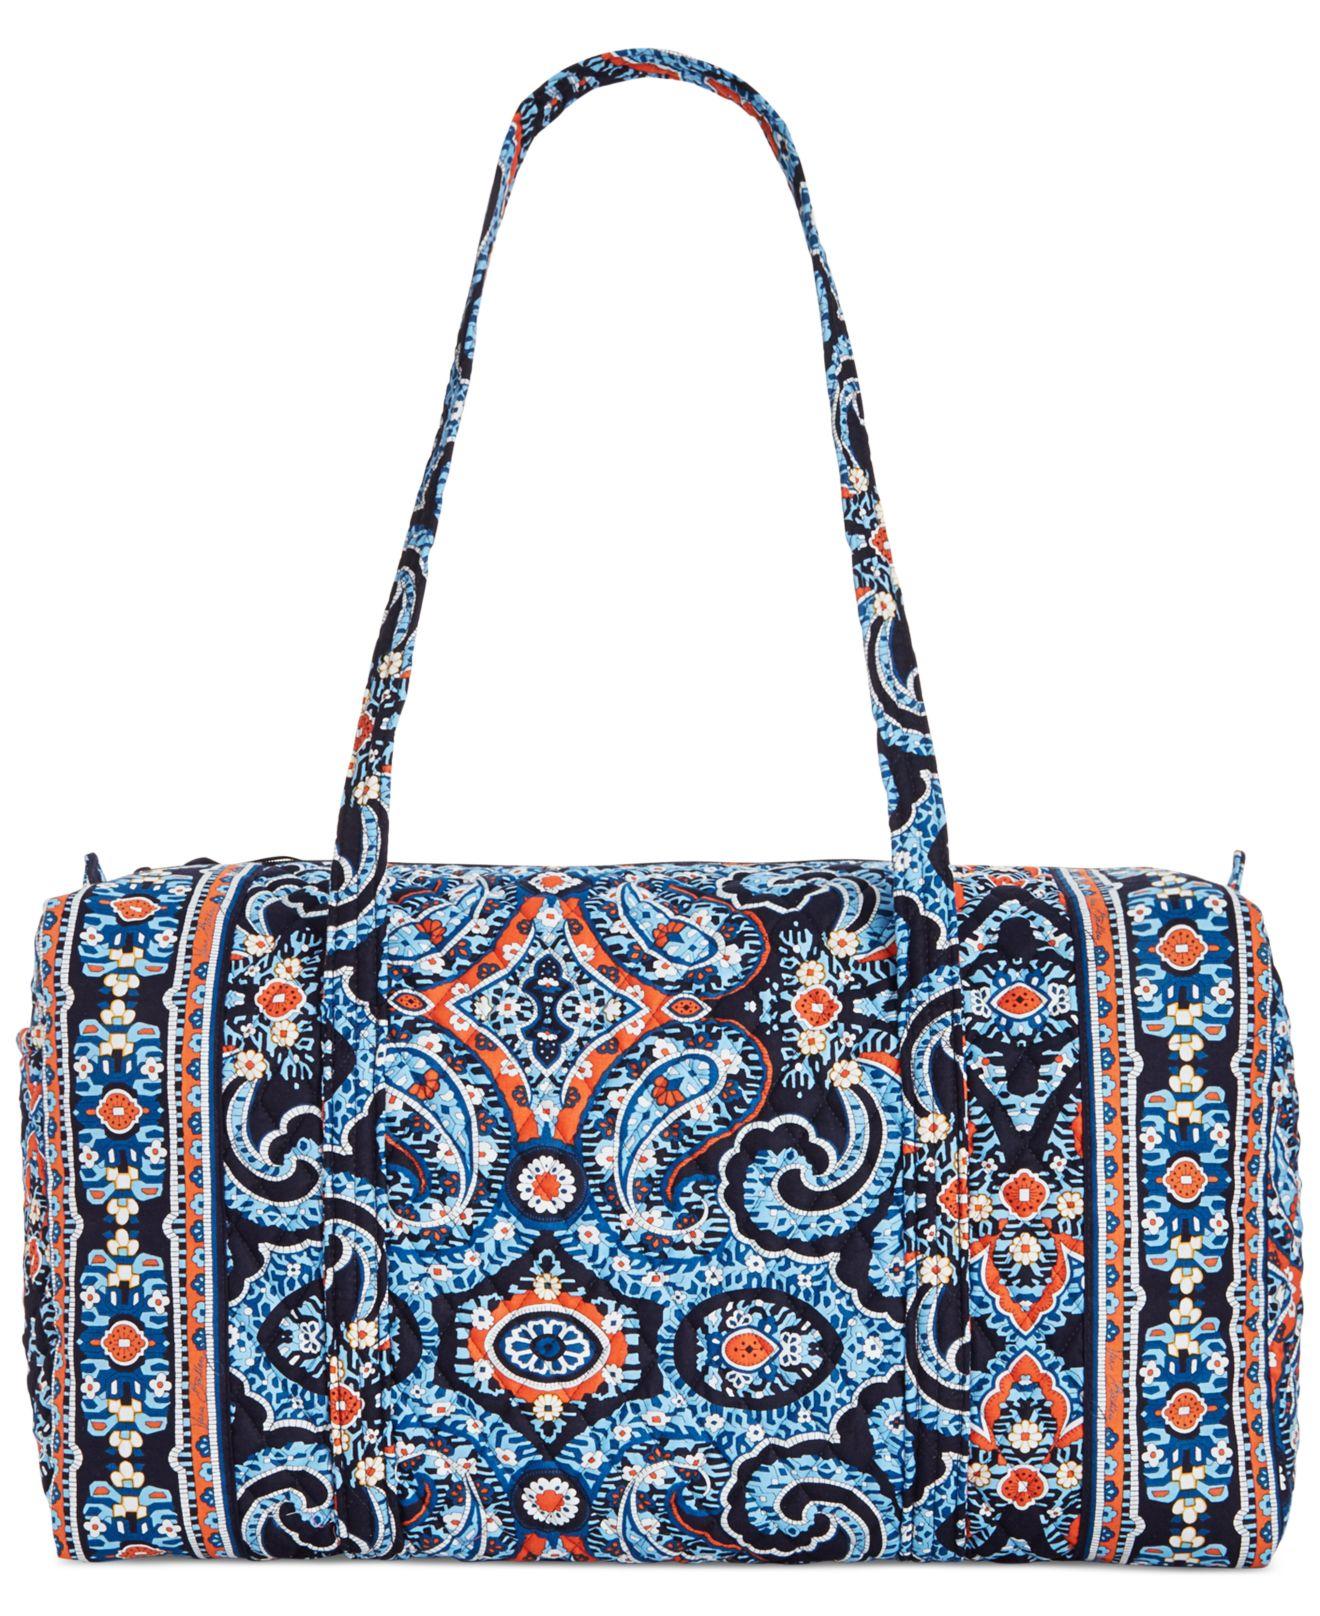 9cfee0798f27 Lyst - Vera Bradley Large Duffle Bag